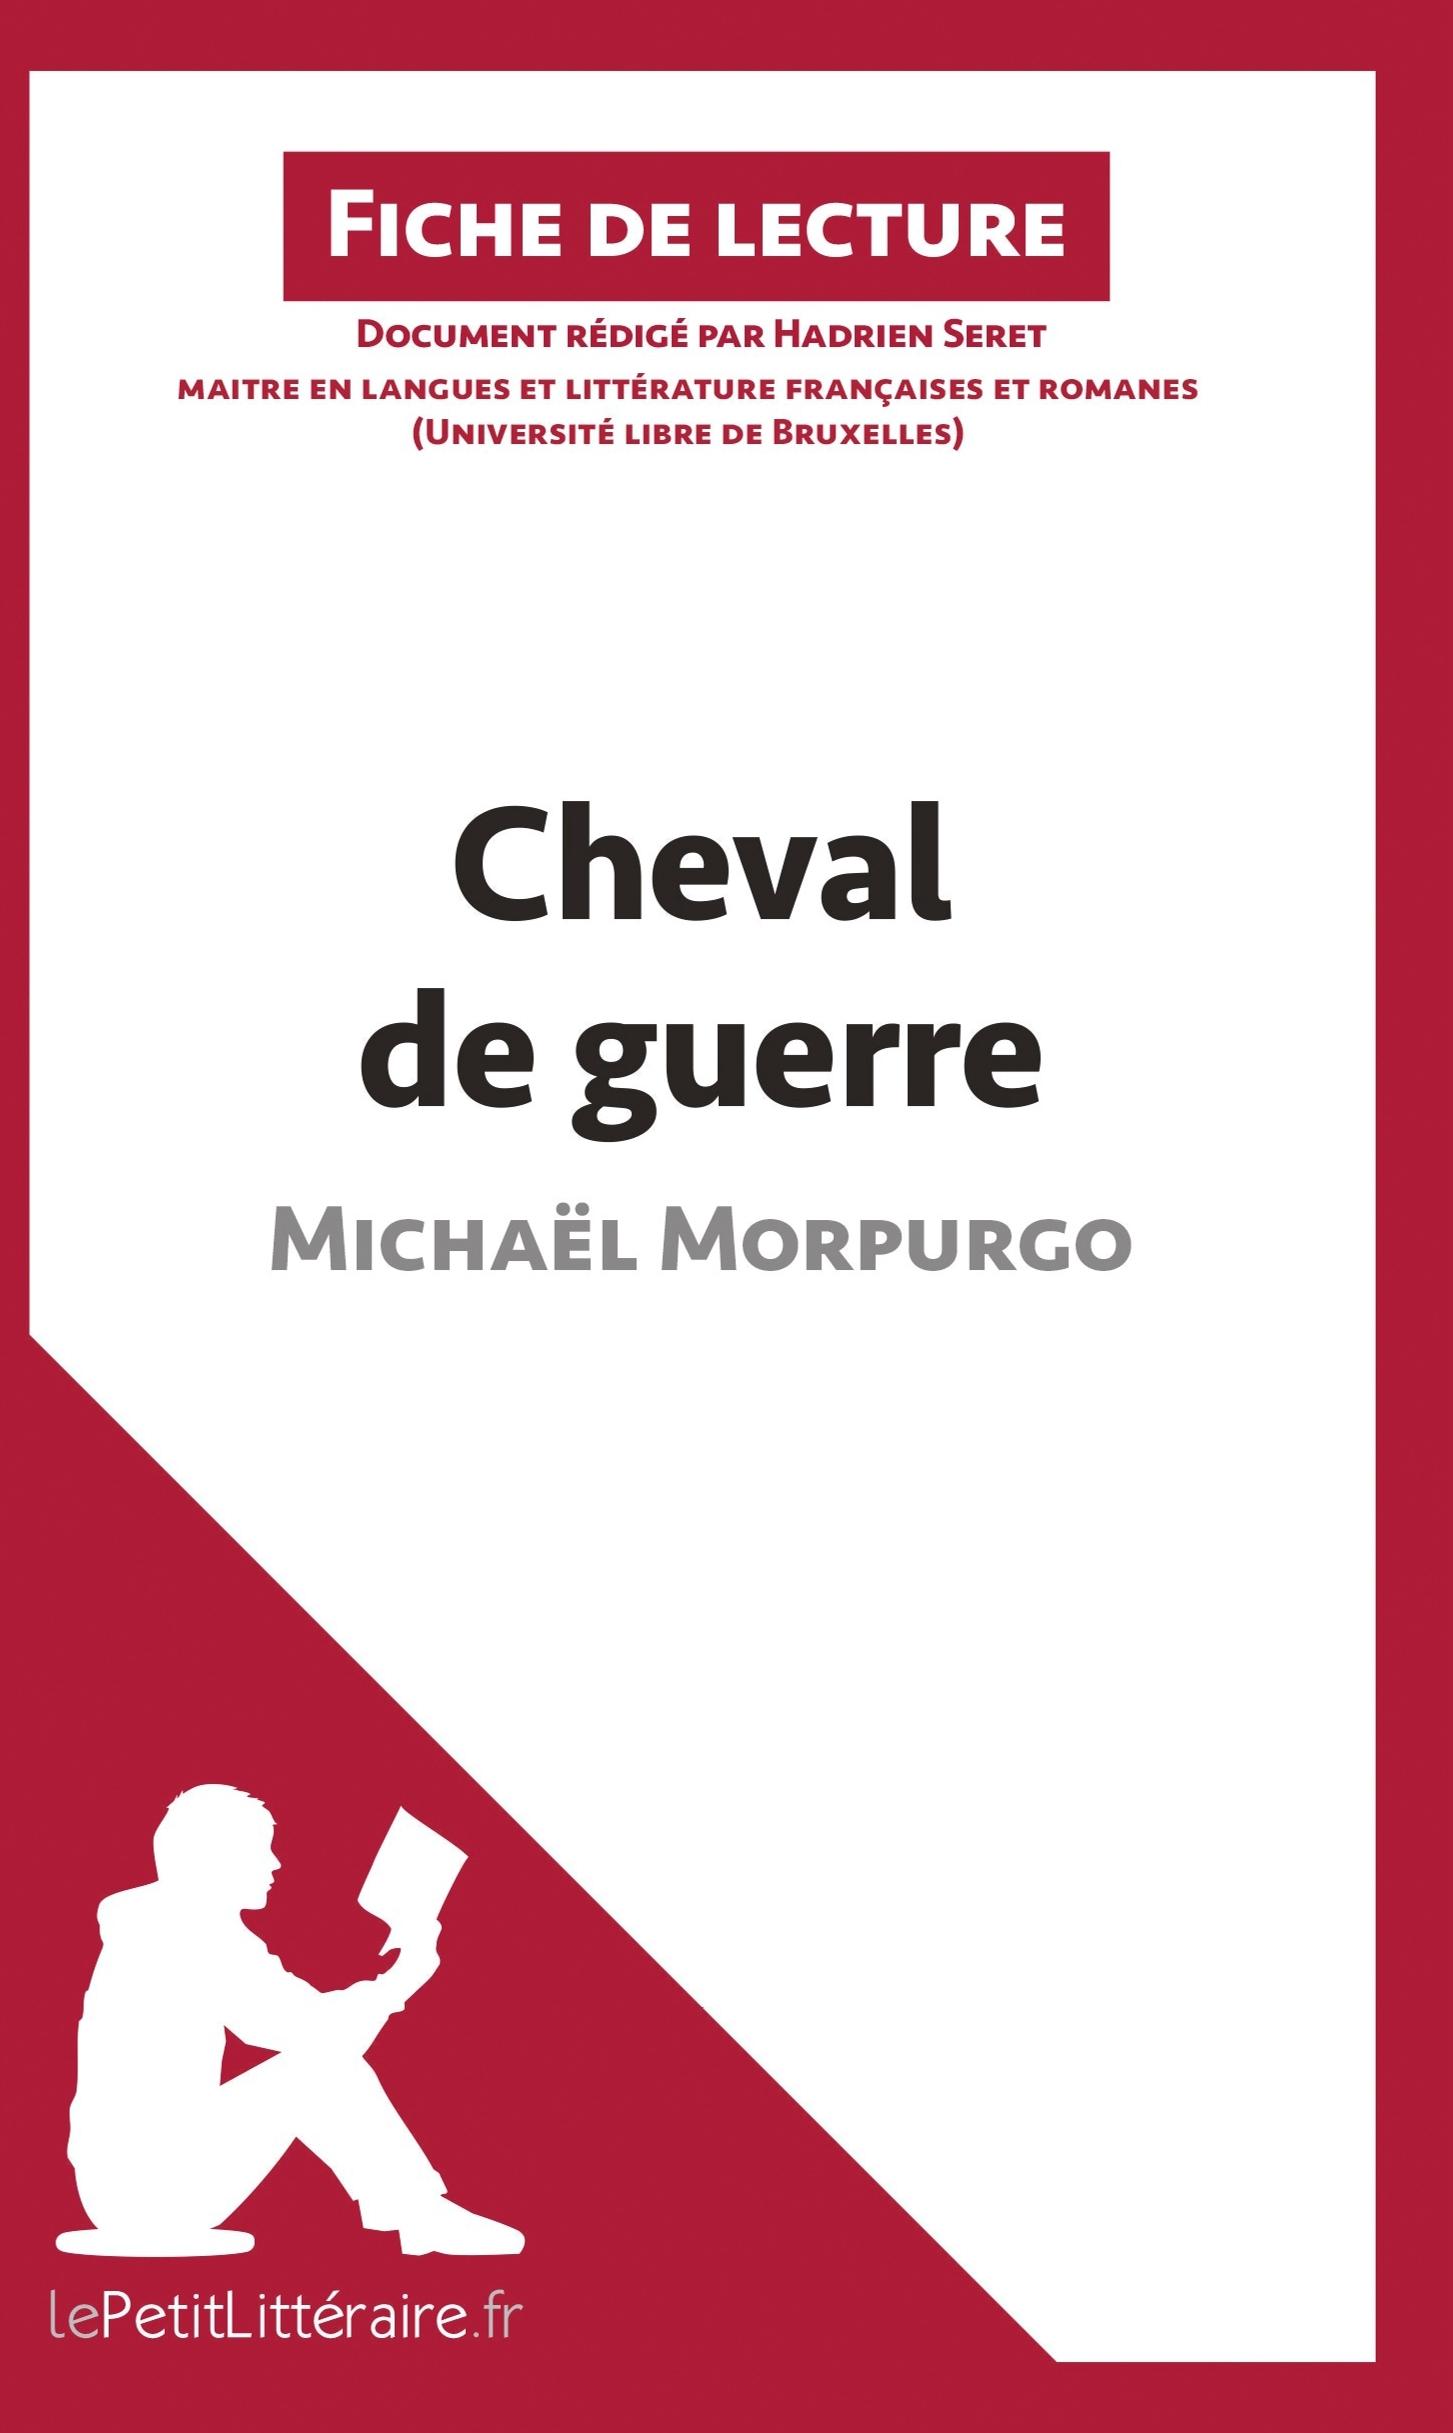 ANALYSE CHEVAL DE GUERRE DE MICHAEL MORPURGO ANALYSE COMPLETE DE L UVRE ET RESU